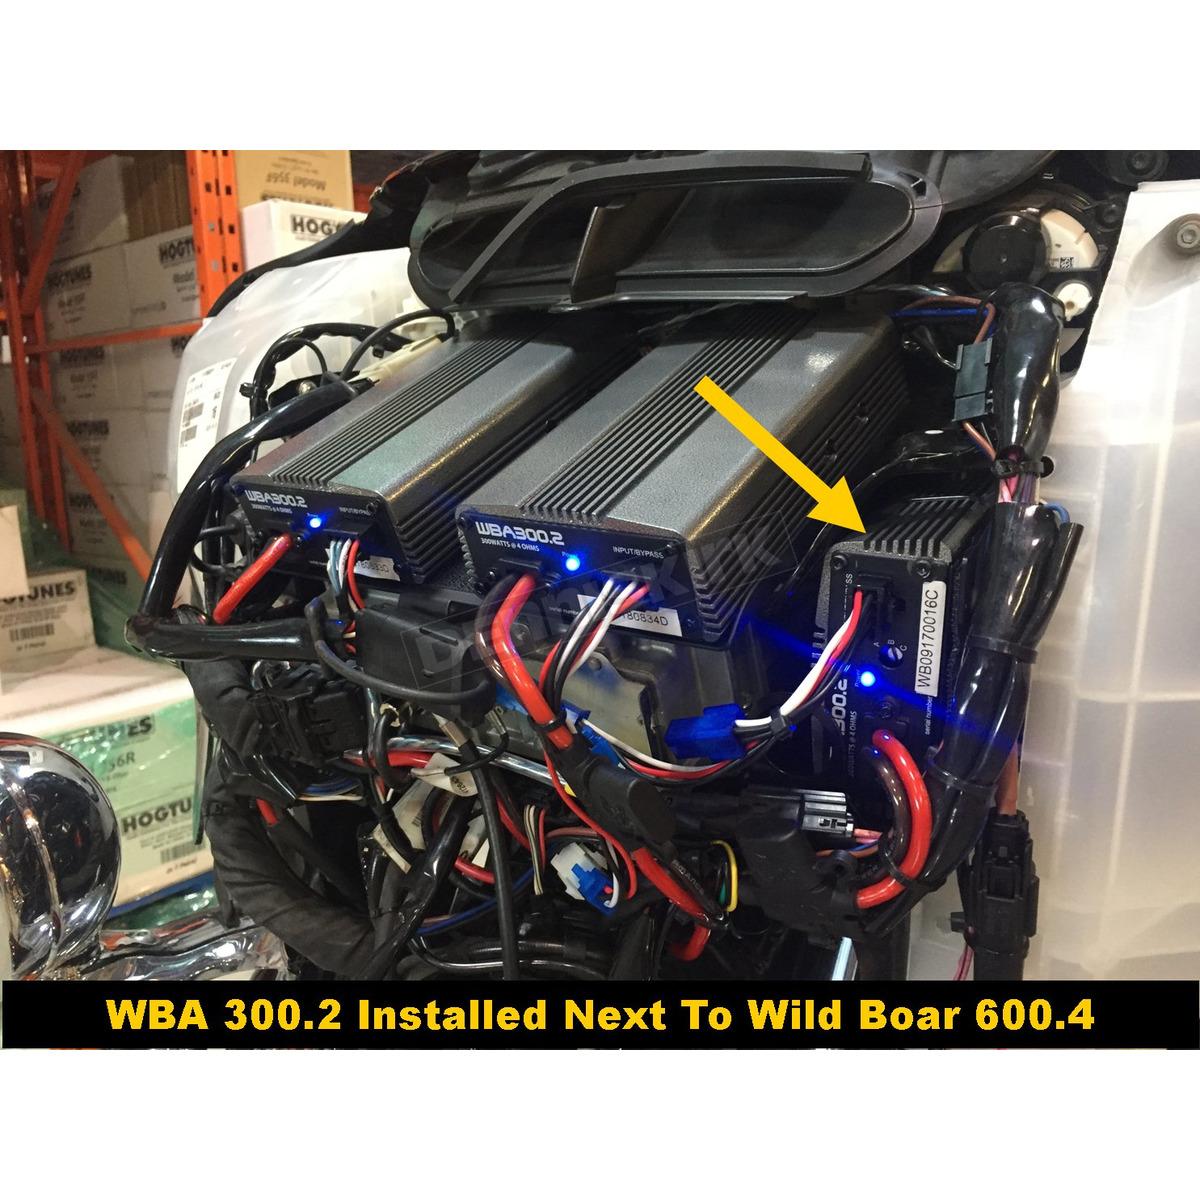 hight resolution of hogtunes wild boar 300 watt amplifier kit wba 300 2 harley hogtunes amp wiring harness